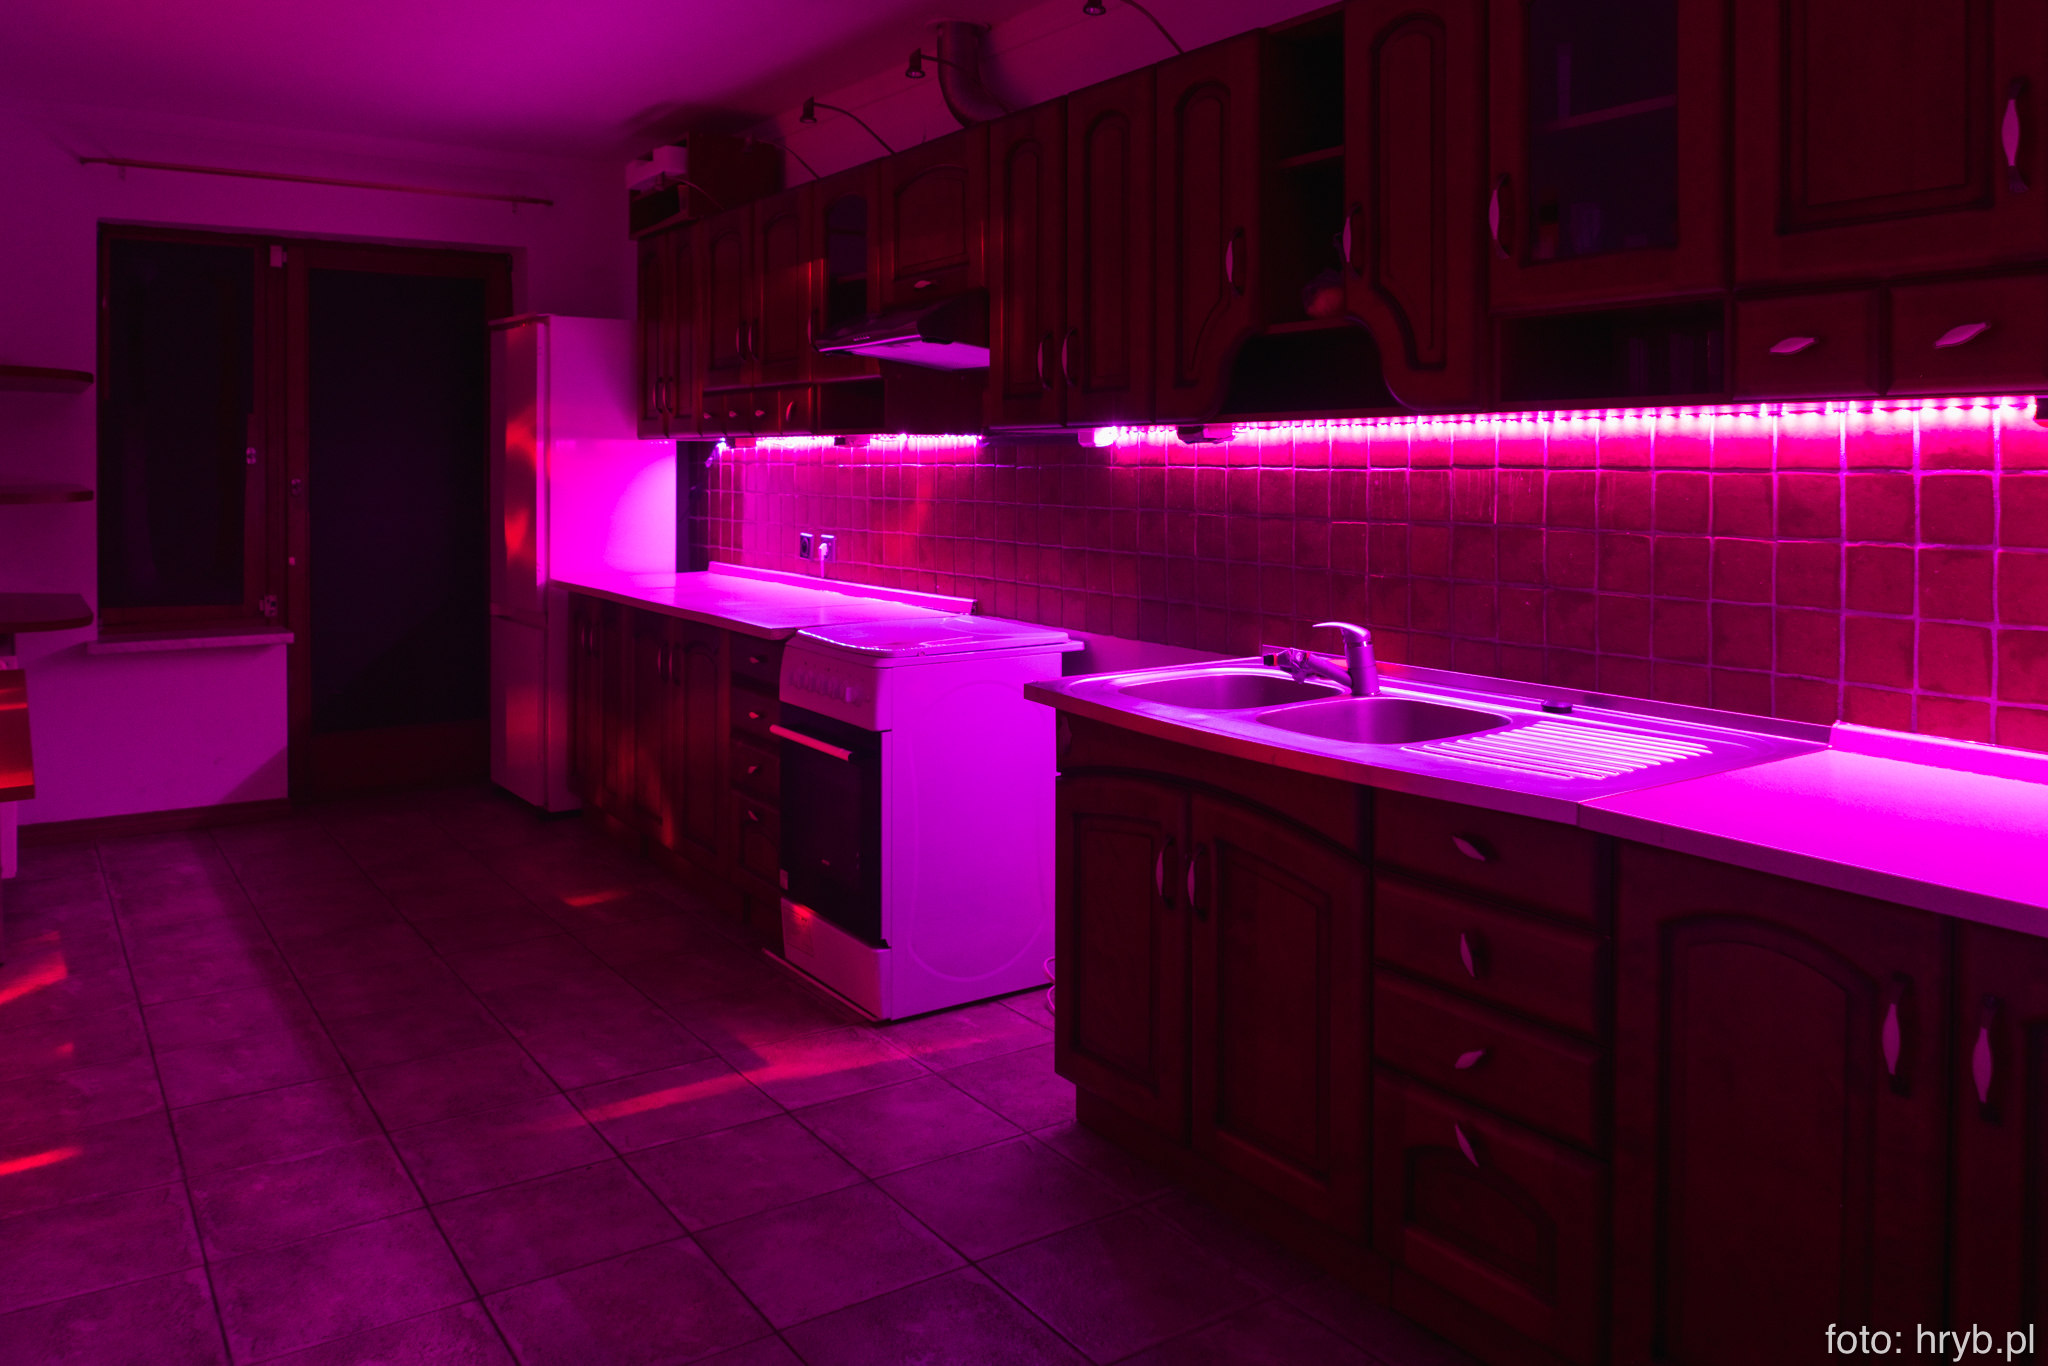 Kuchnia w domu na imprezy